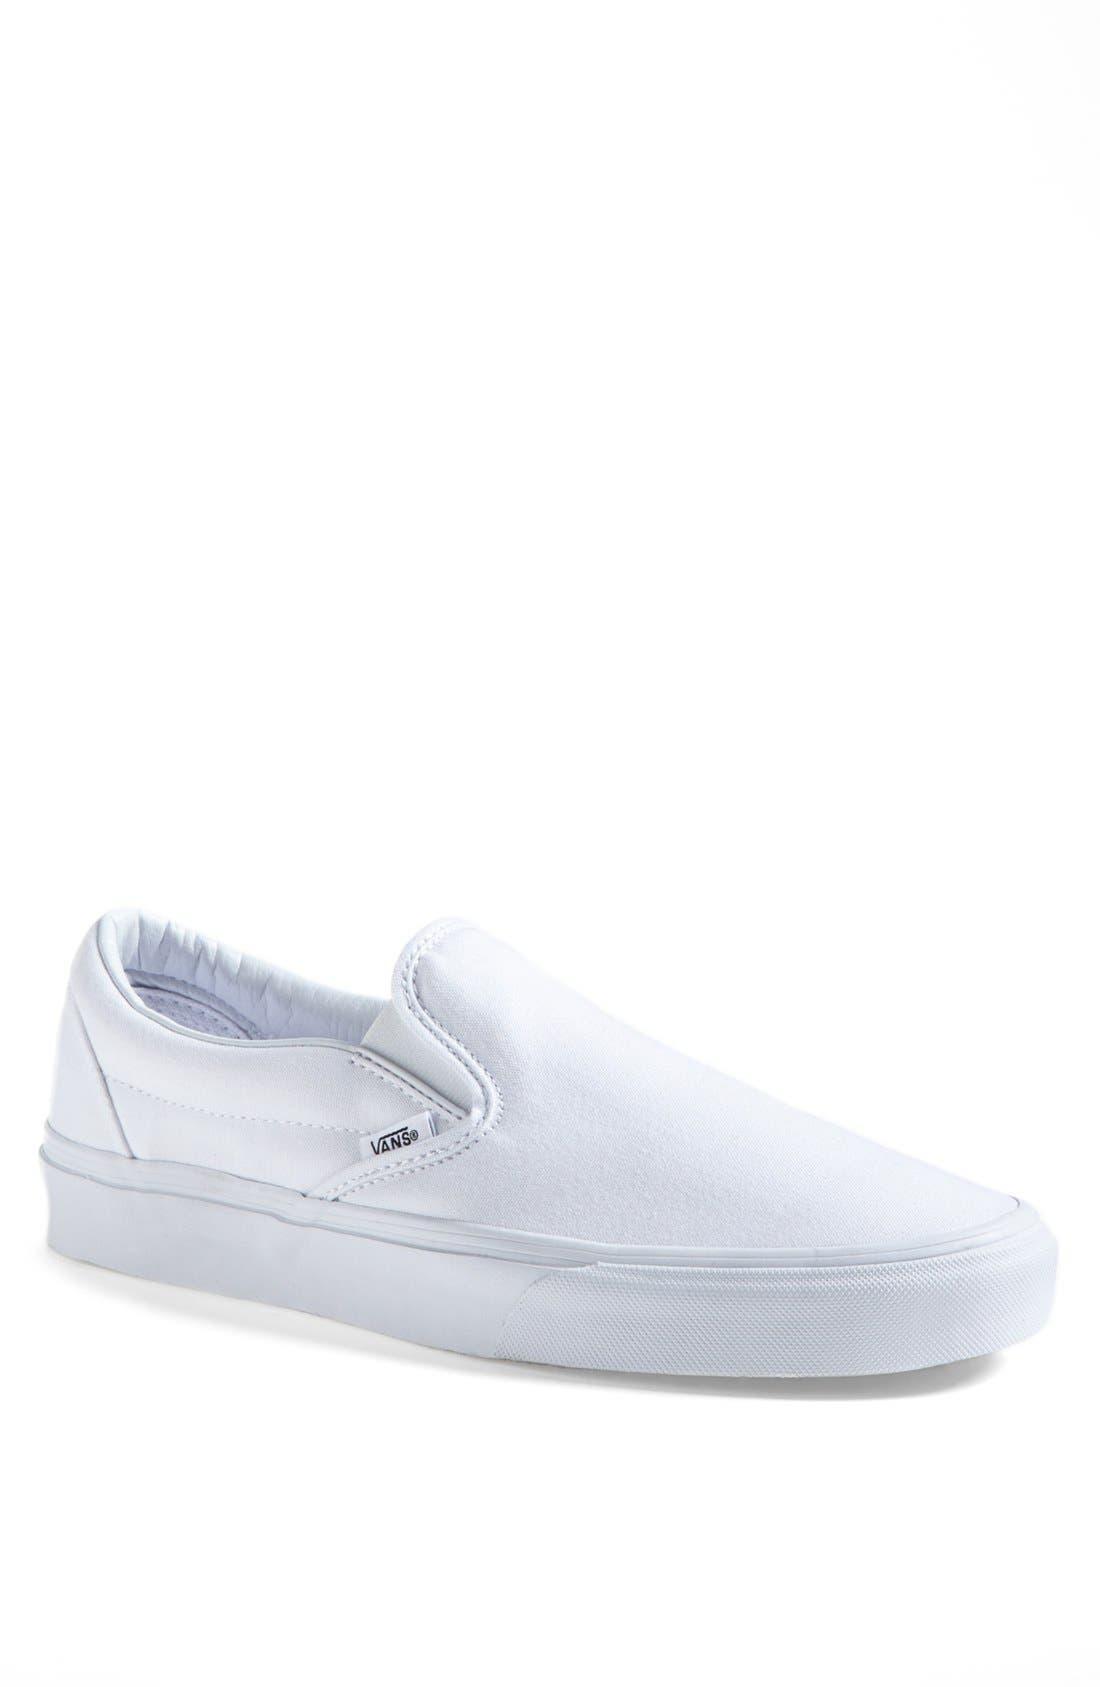 VANS Classic Slip-On, Main, color, TRUE WHITE